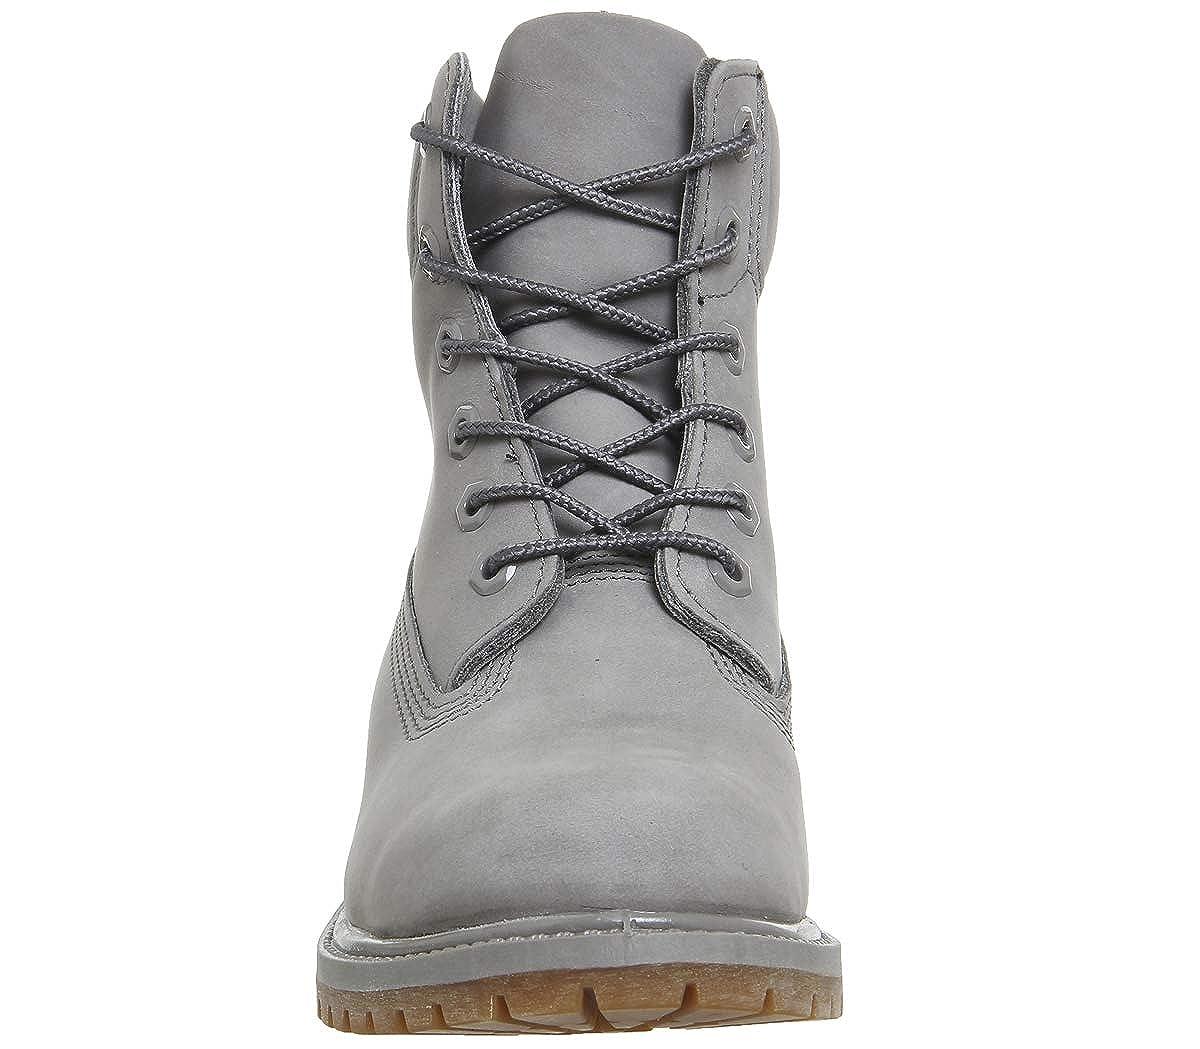 Timberland - 6in Premium Mono, Stivali Stivali Stivali Donna | Elegante E Robusto Pacchetto  | Sig/Sig Ra Scarpa  4f512d